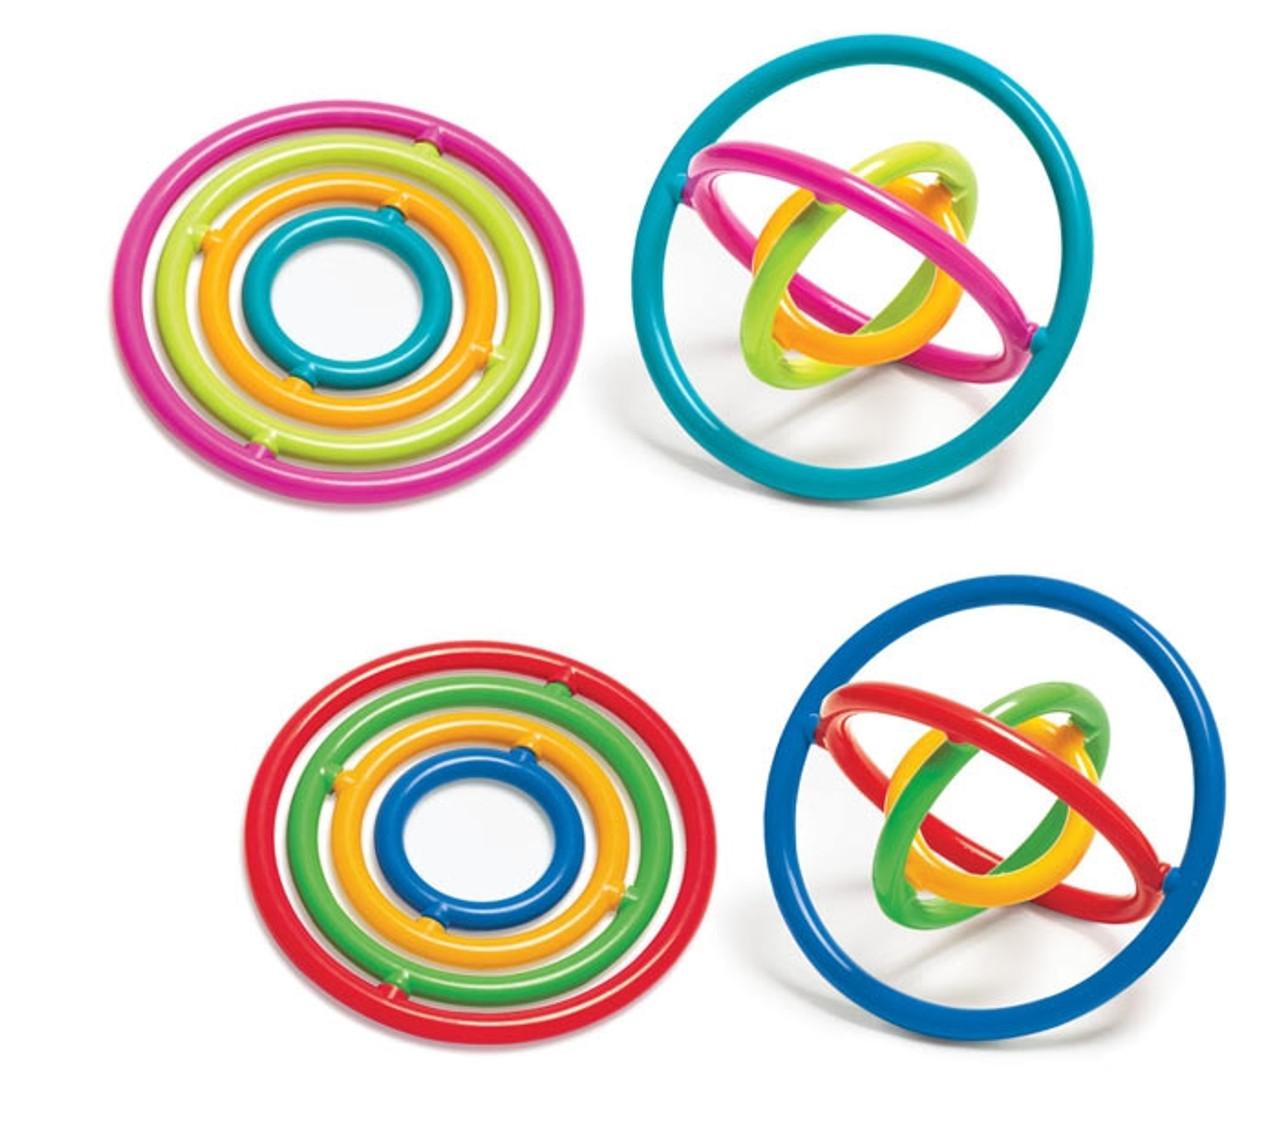 Gyrobi; assorted colors